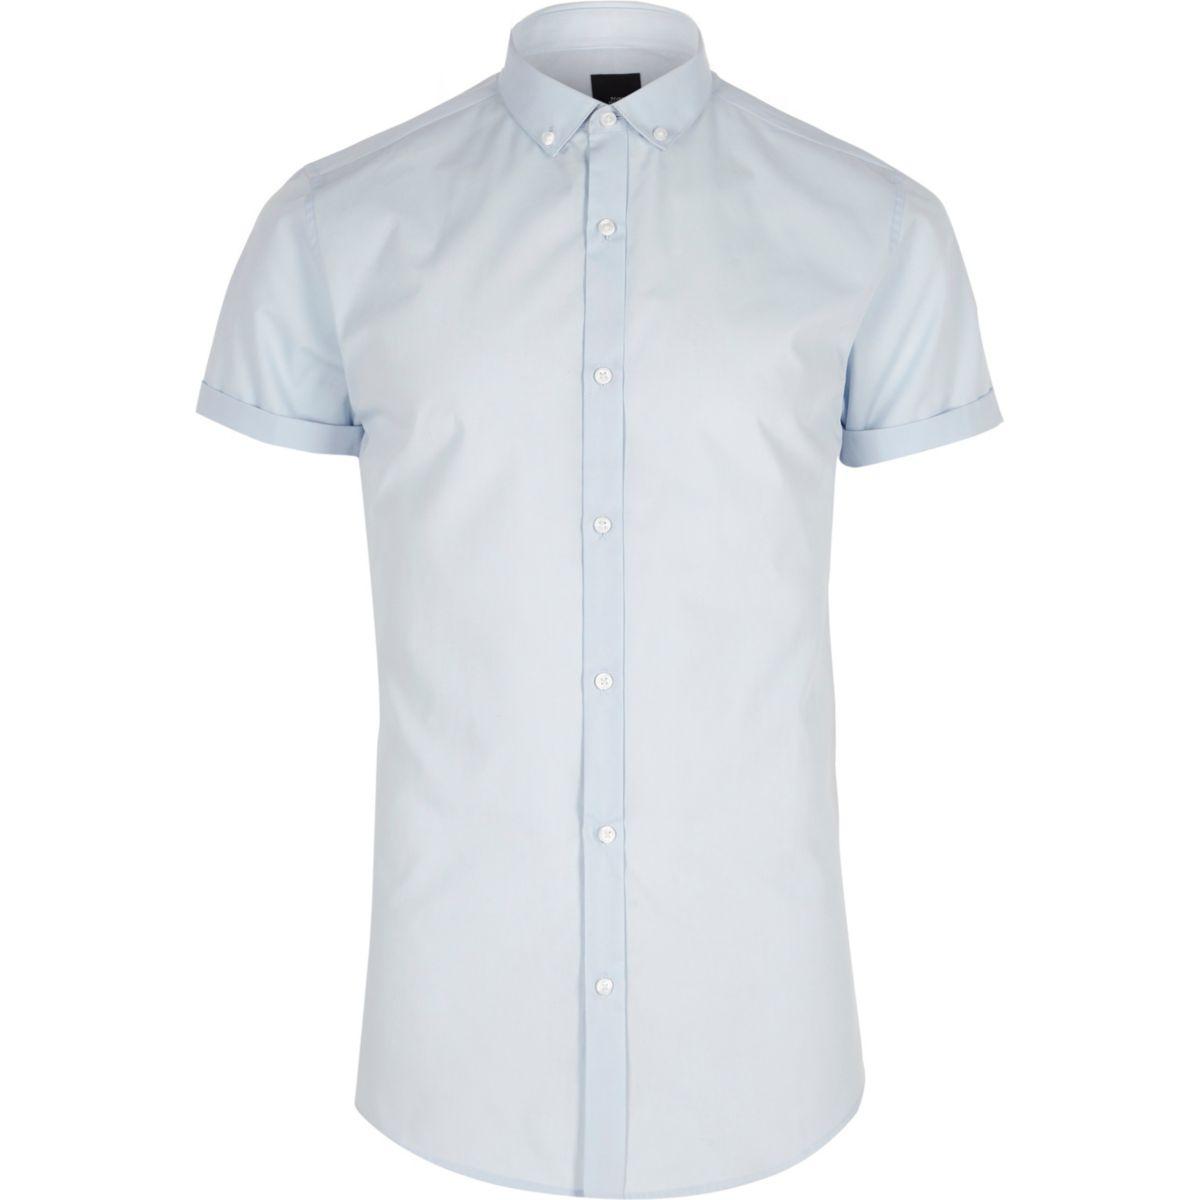 Kurzärmliges Slim Fit Hemd mit Knopfleiste